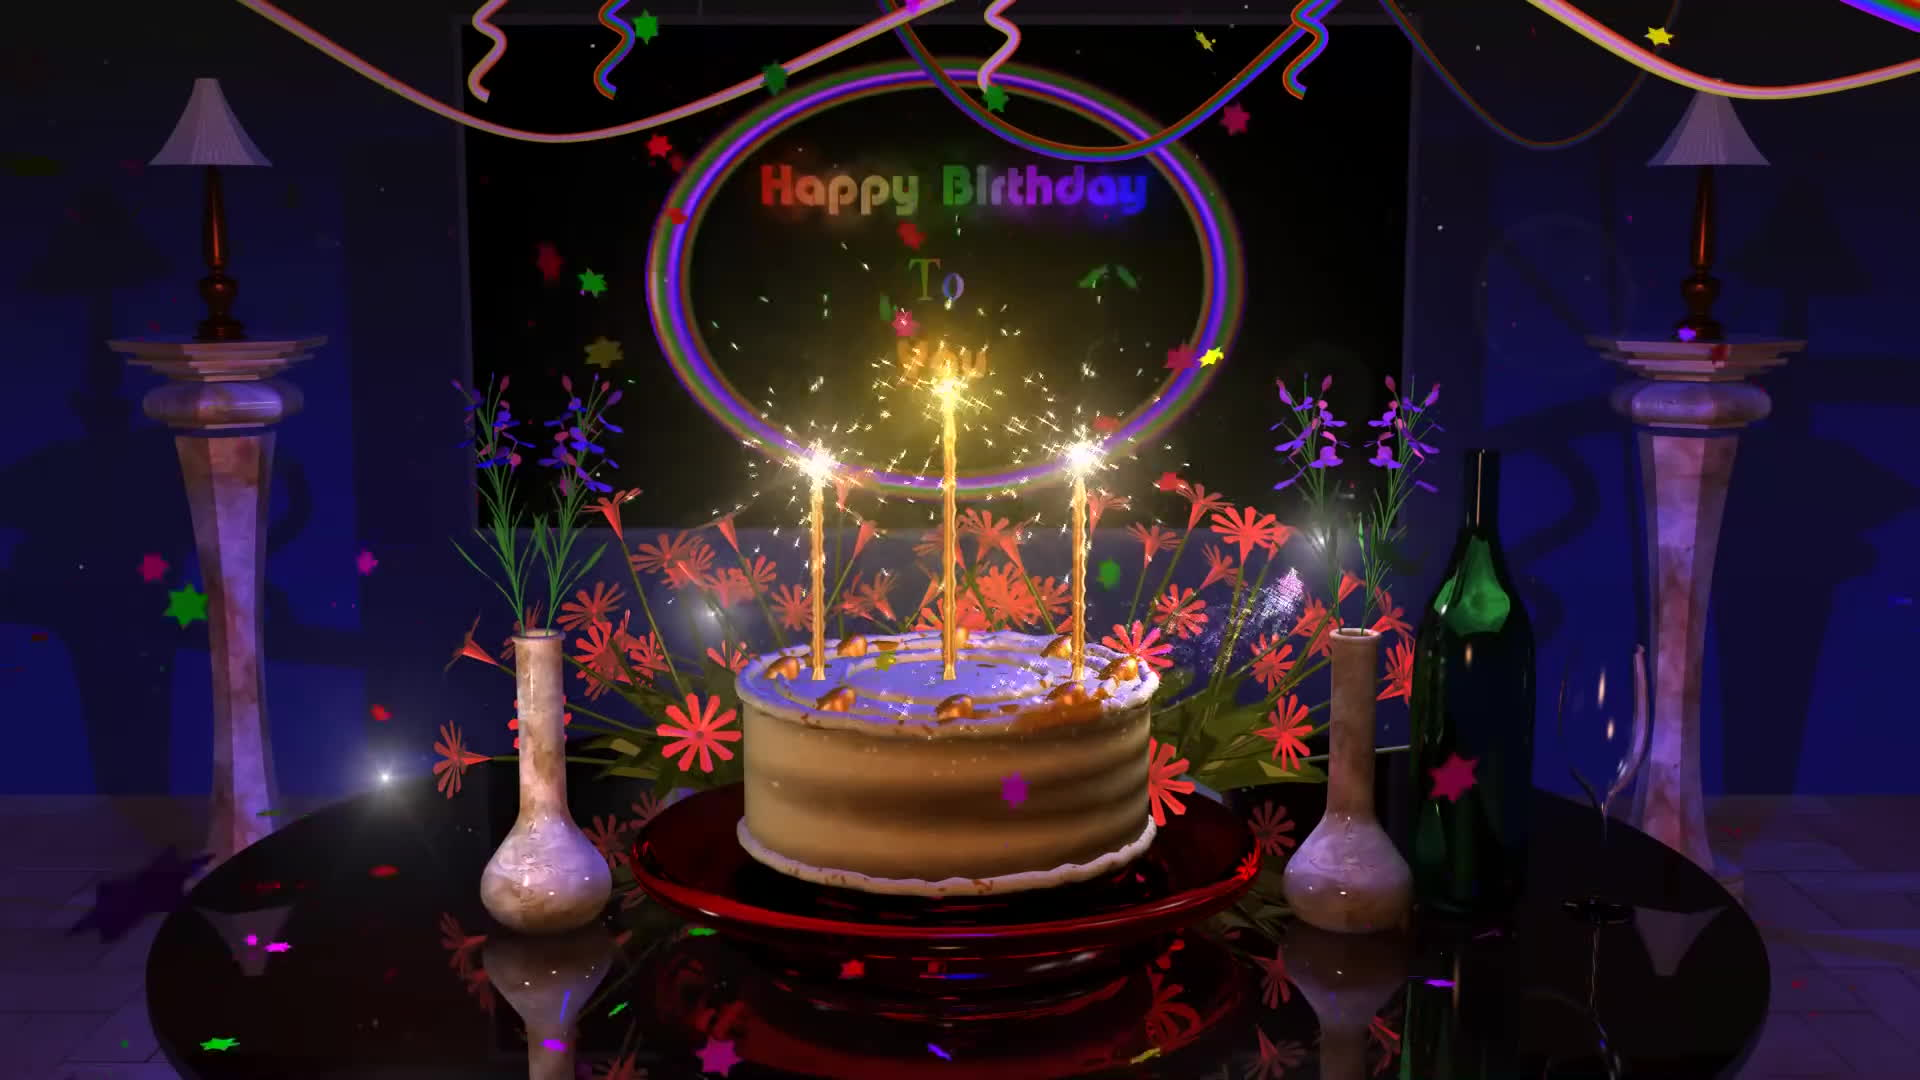 Magical Happy Birthday Animation Gif By Deebrhm At Deebrhm Find